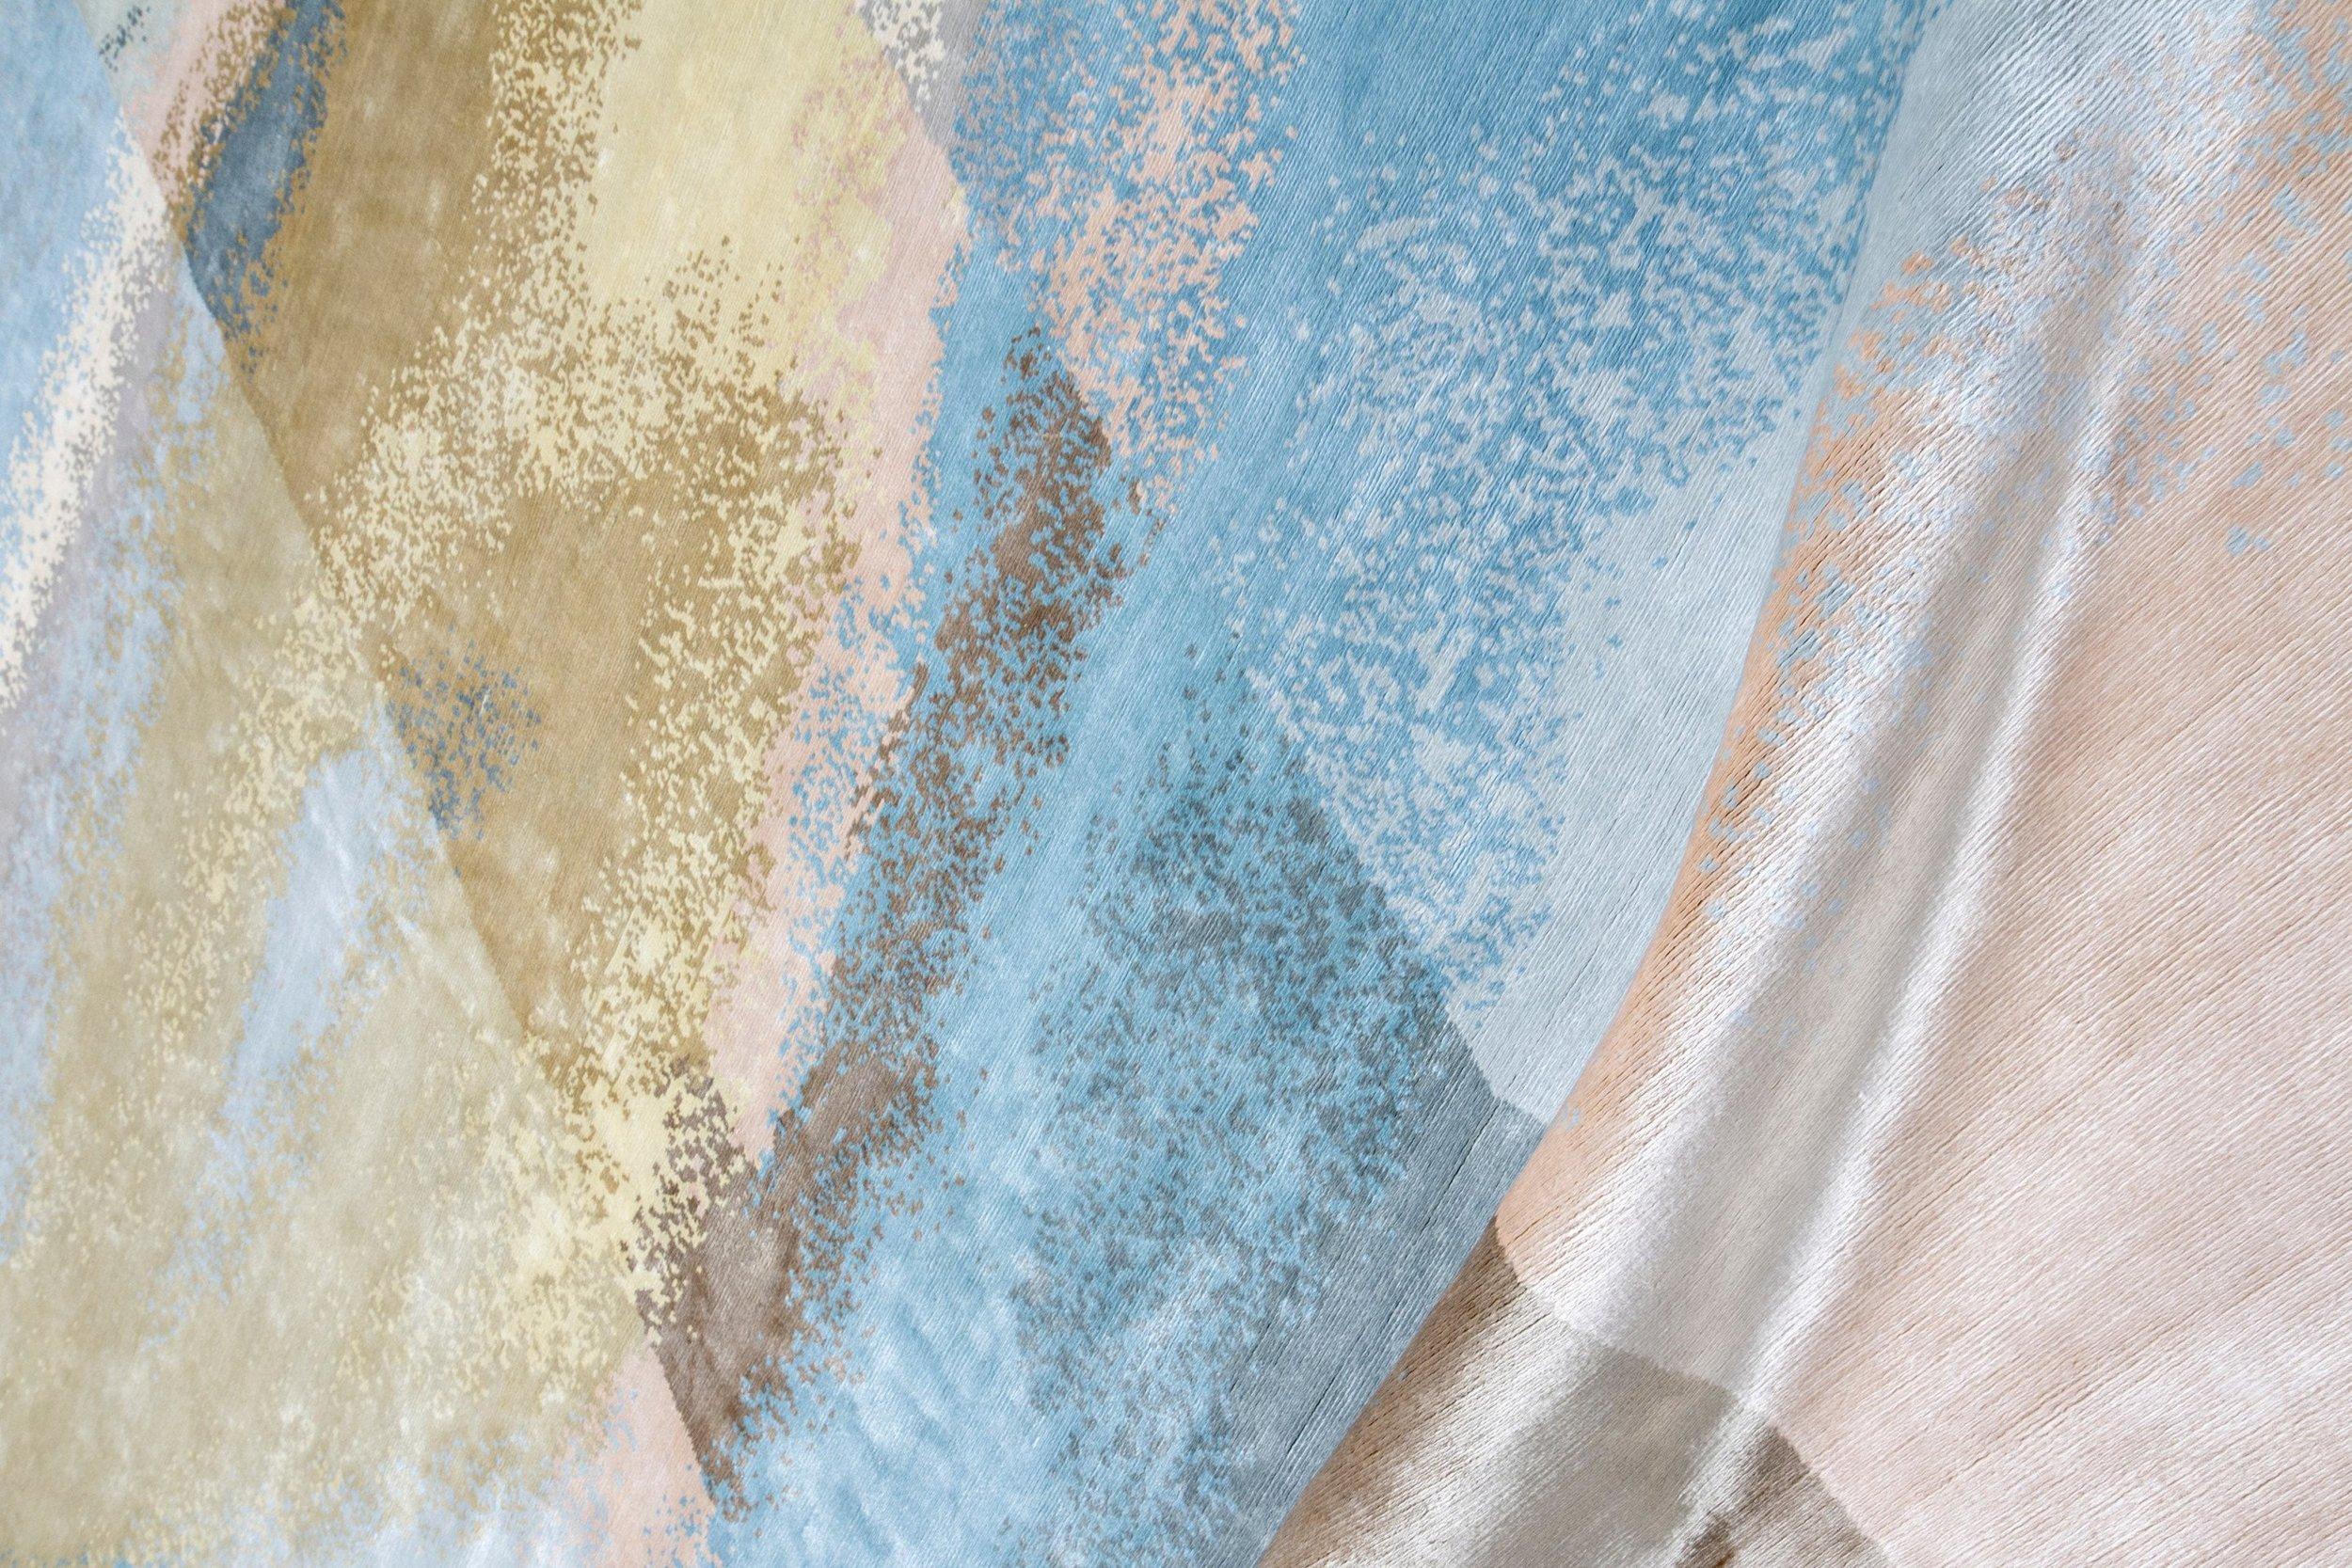 EDITION BOUGAINVILLE selyem szőnyeg ARAL SUNRISE